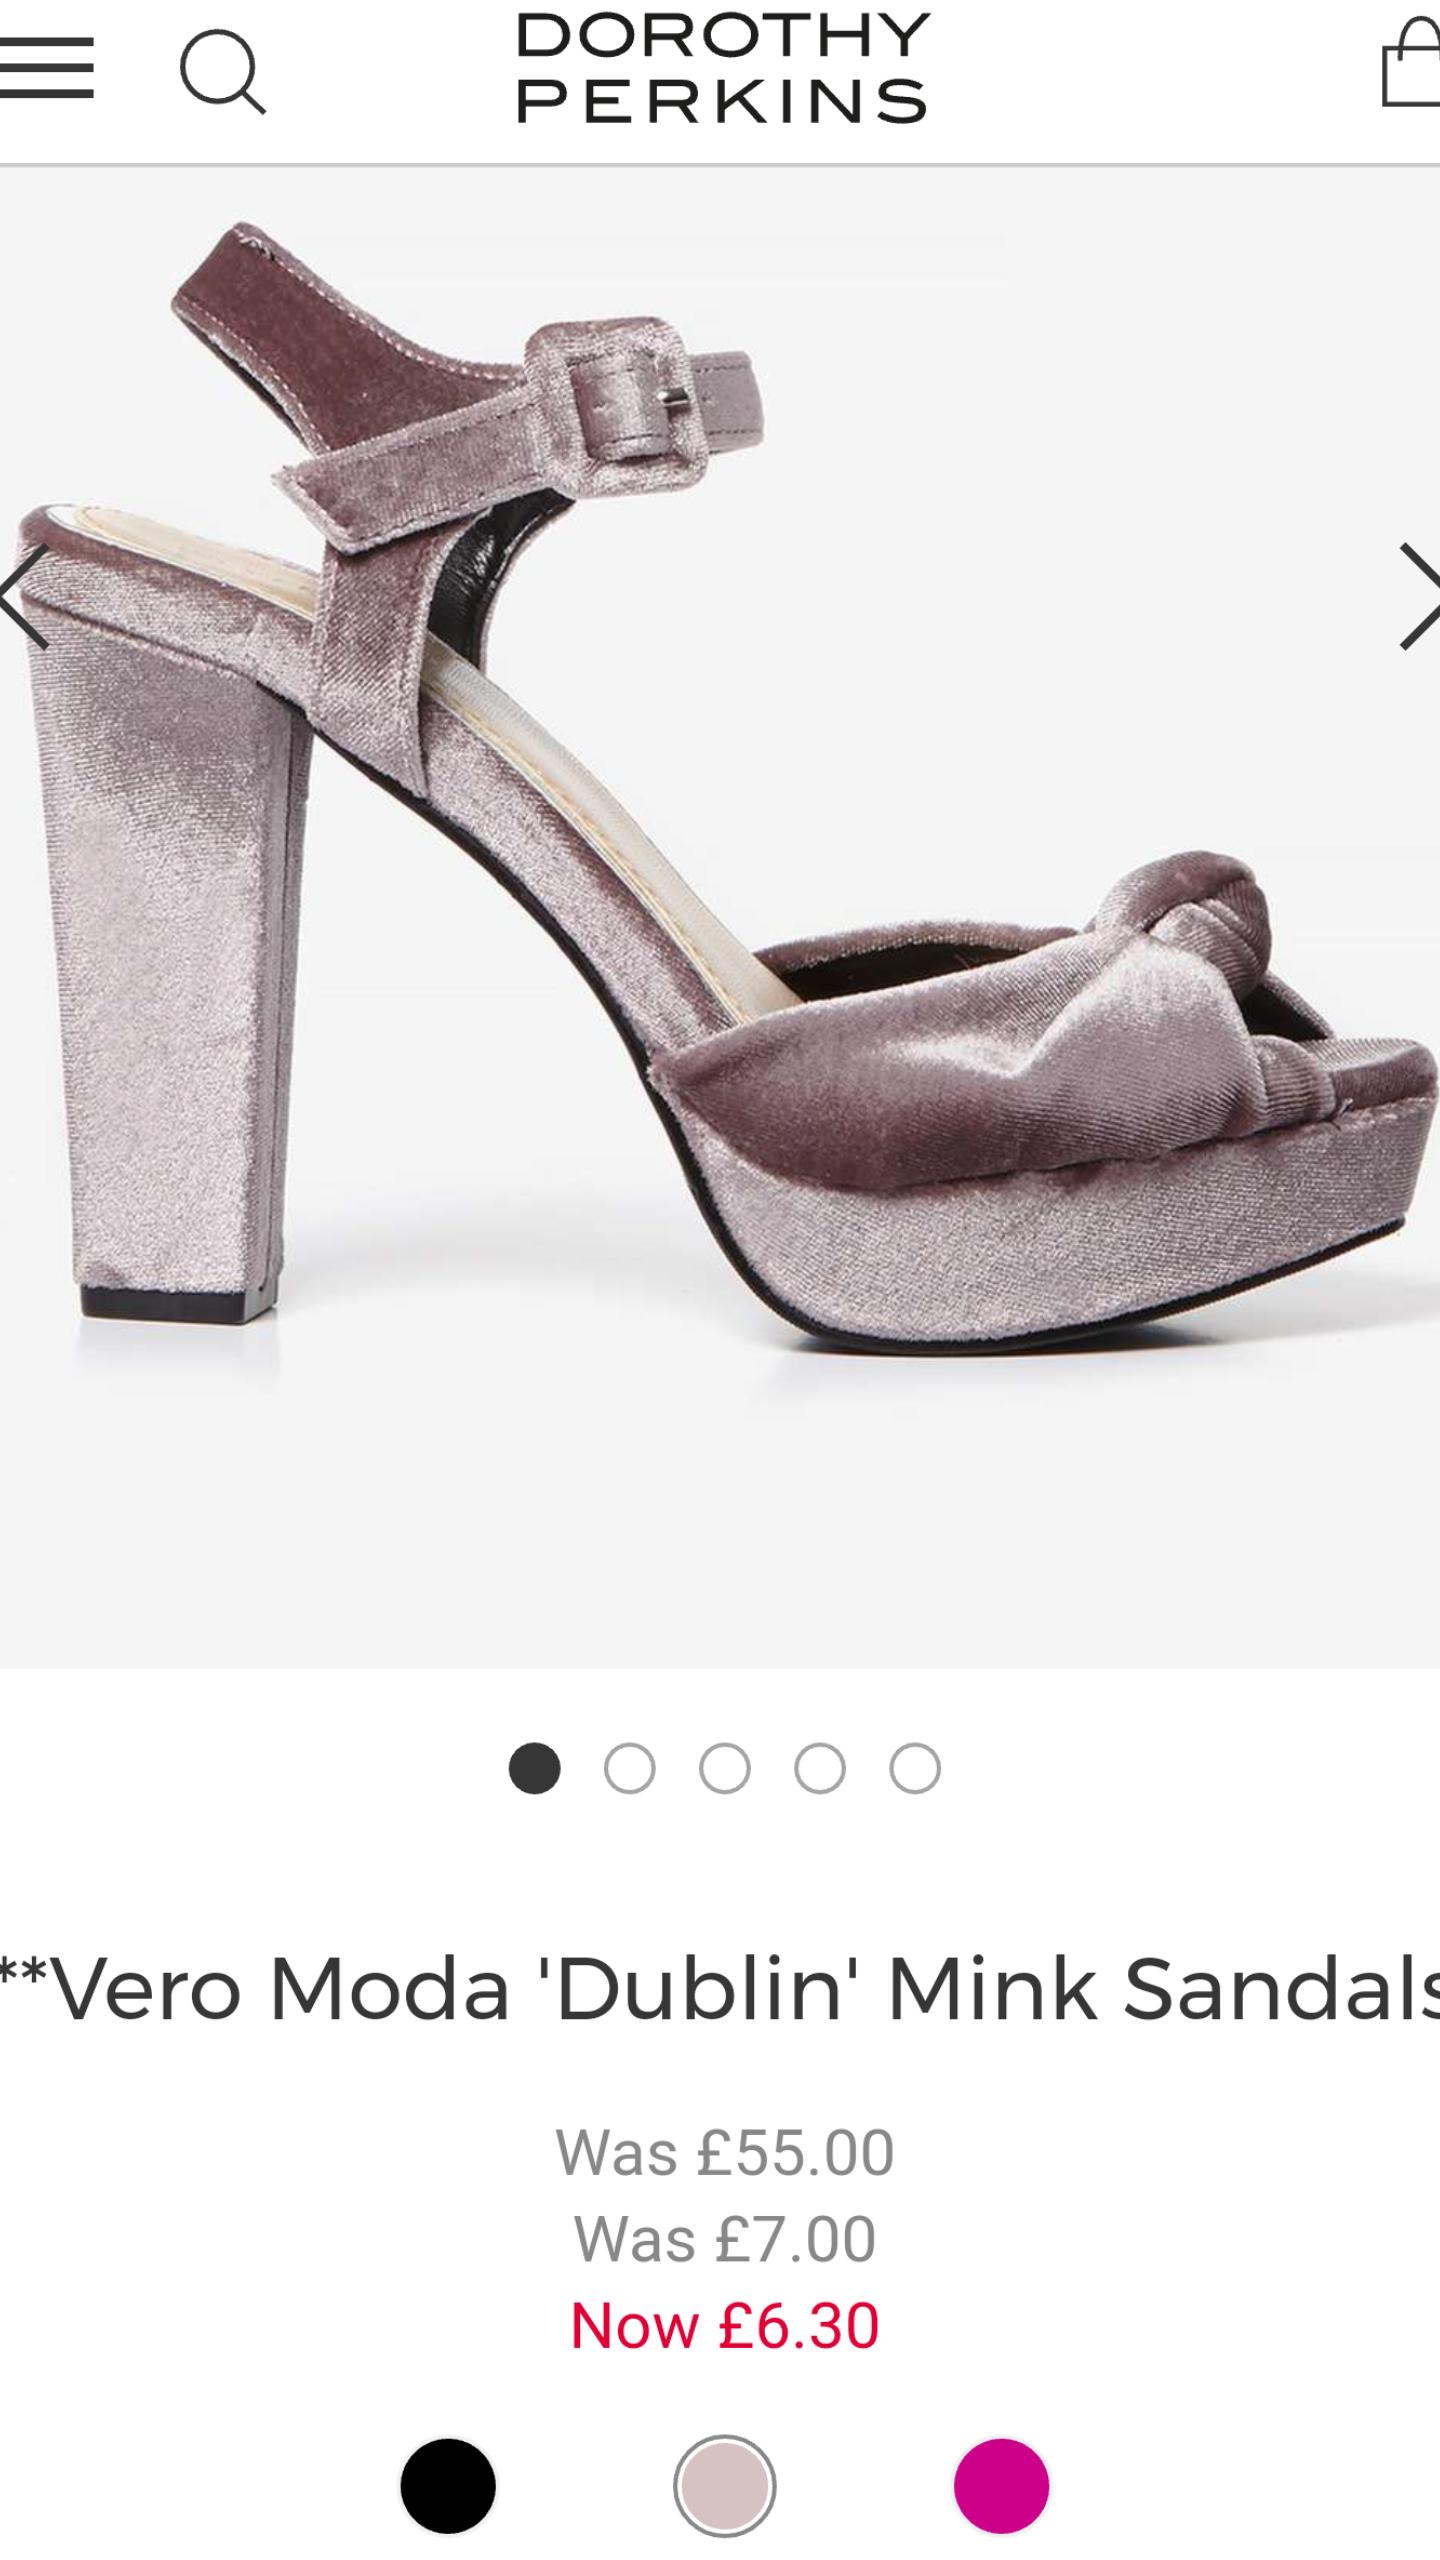 Vero Moda 'Dublin' Mink Sandals - Dorothy Perkins - £6.30 (free C&C)